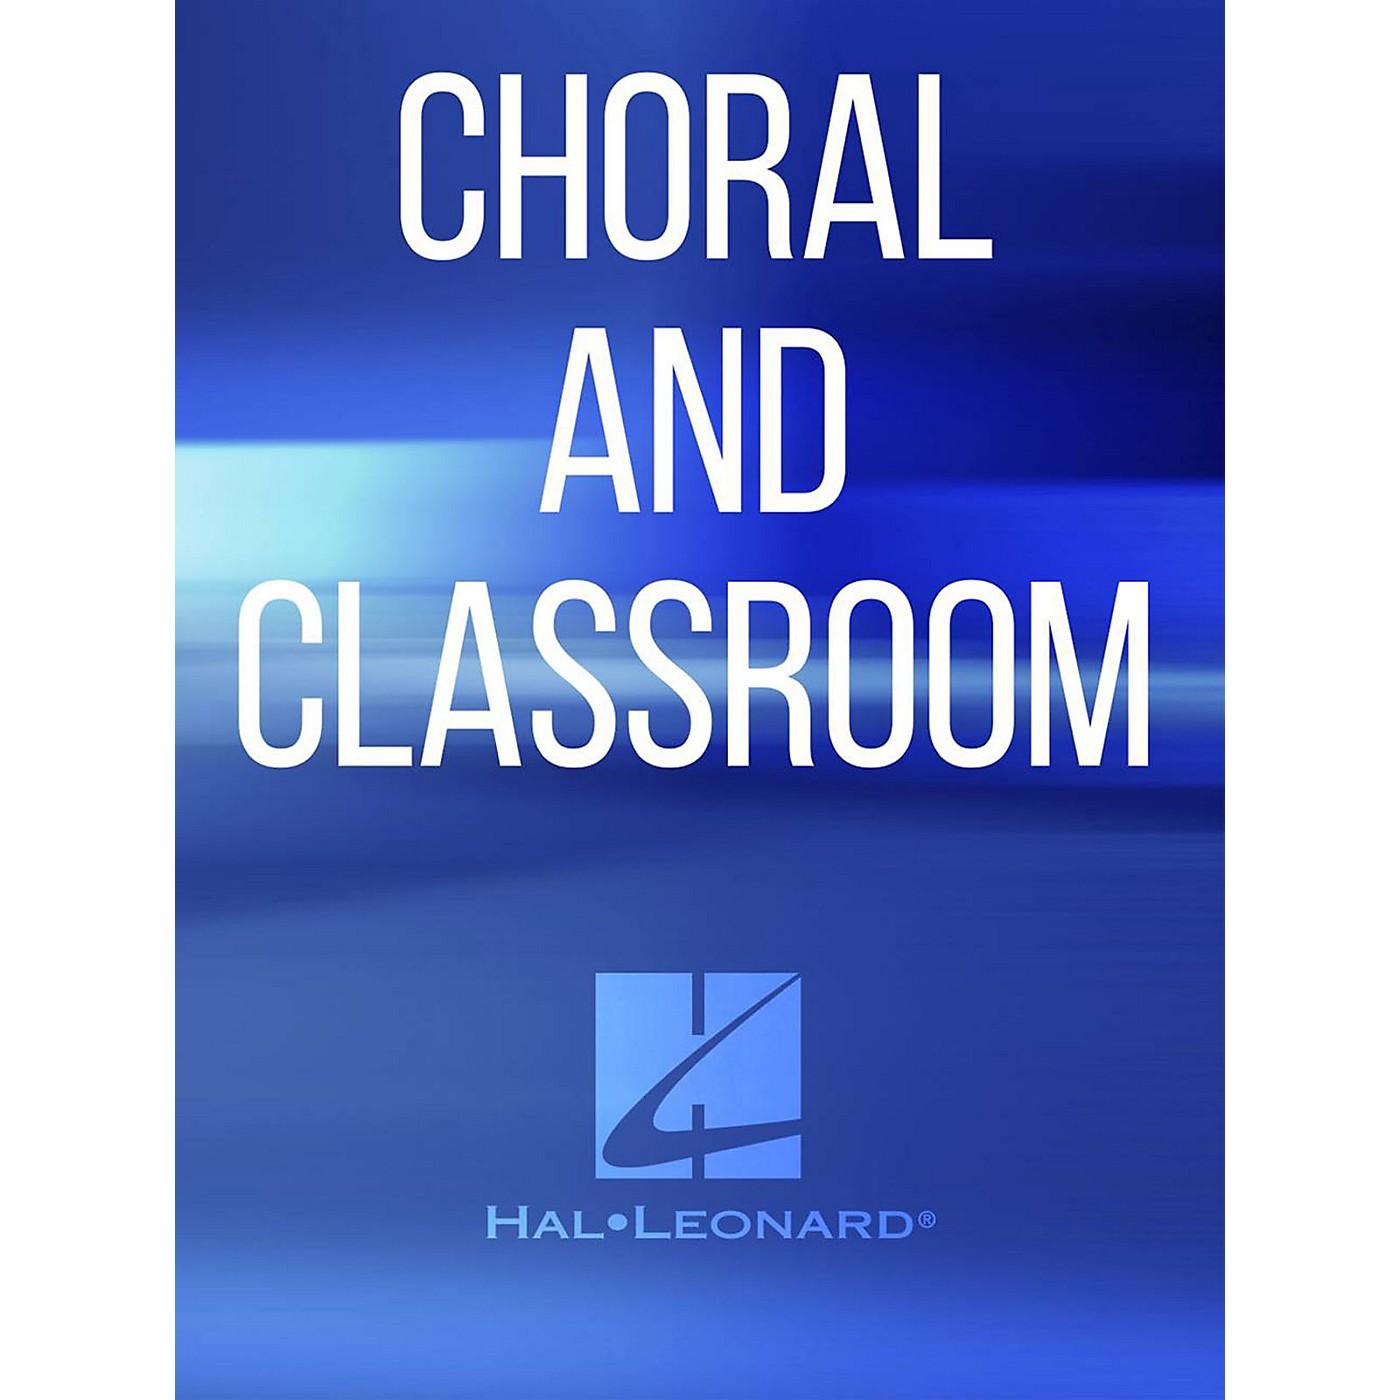 Hal Leonard Cielito Lindo SATB Composed by William Belen thumbnail